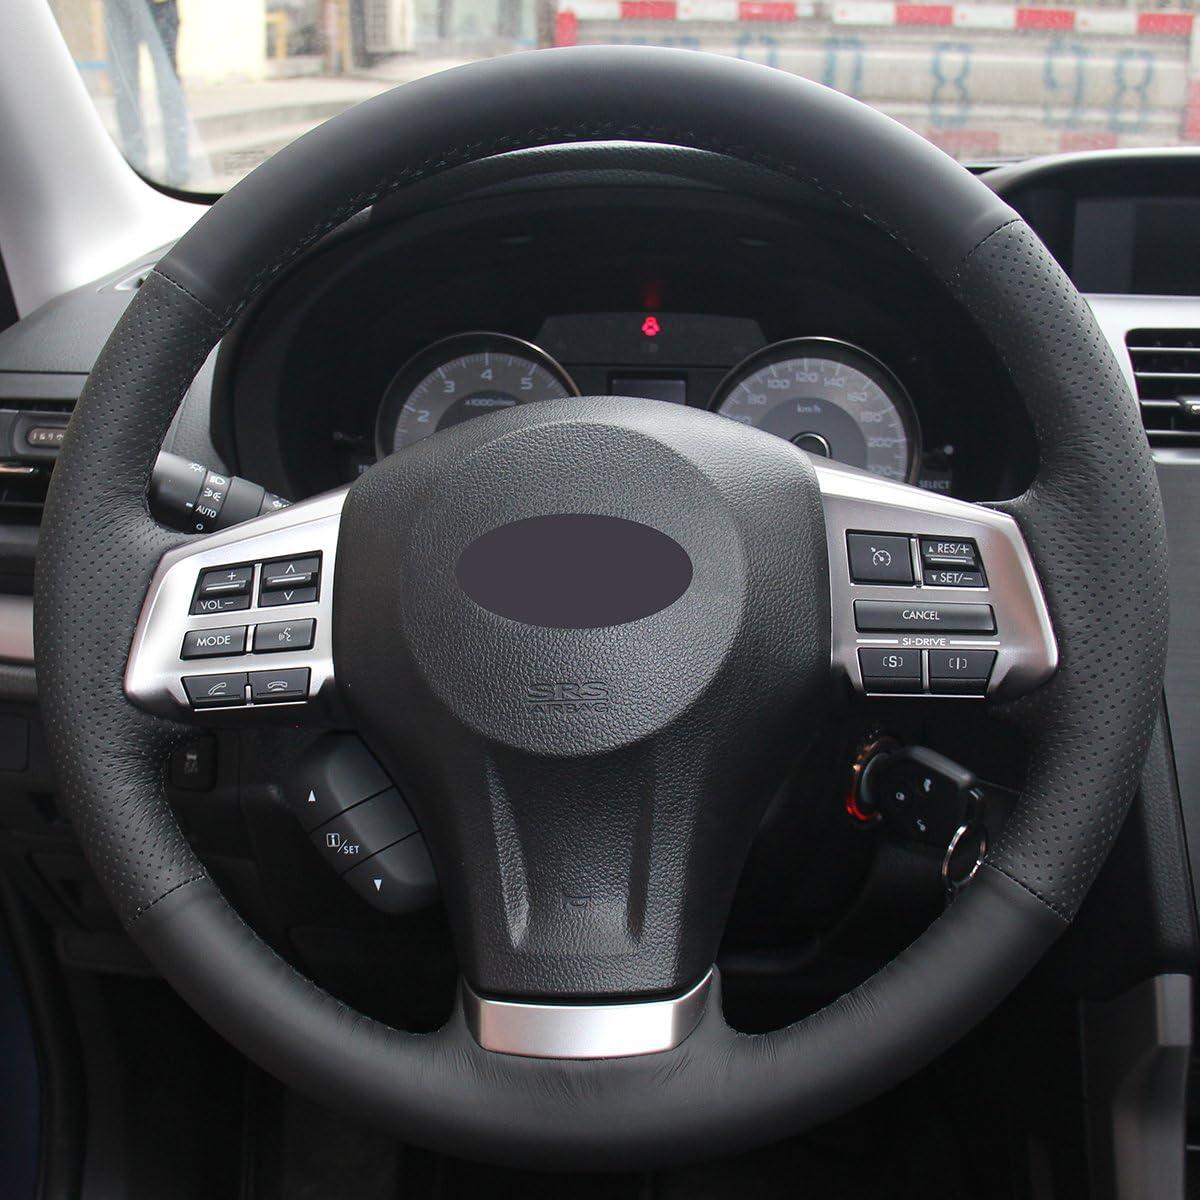 2012 2013 2014 2015 Subaru Impreza Hand Sewing Black Genuine Leather Steering Wheel Cover for 2014 2015 2016 Subaru Forester 2012 2013 2014 Subaru Legacy 2012 2013 2014 Subaru Outback 2013 2014 2015 Subaru XV Crosstrek